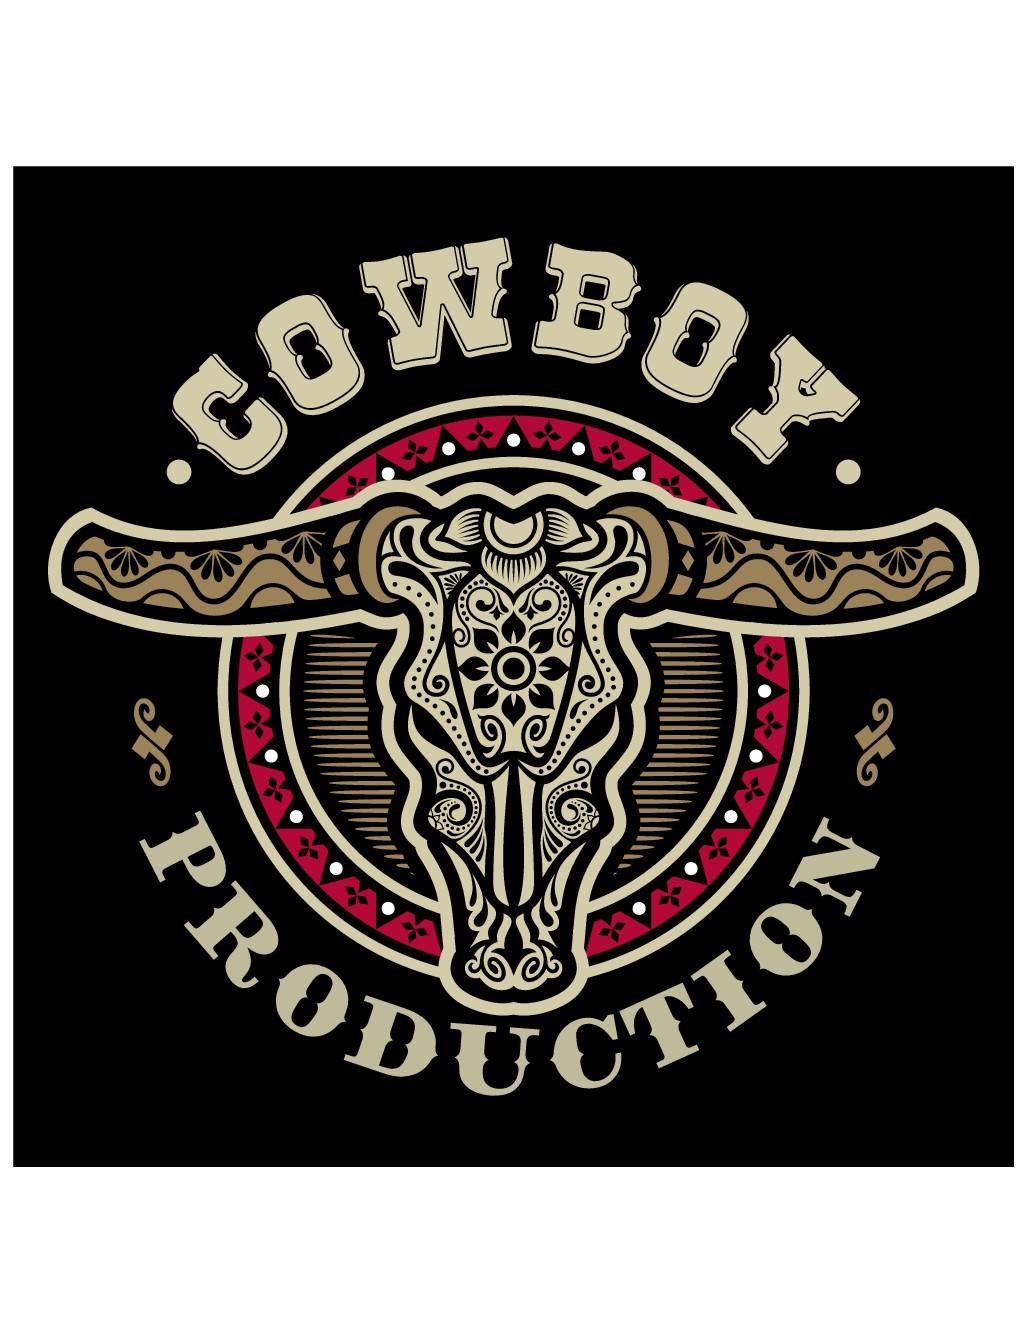 Let the cowboy rock